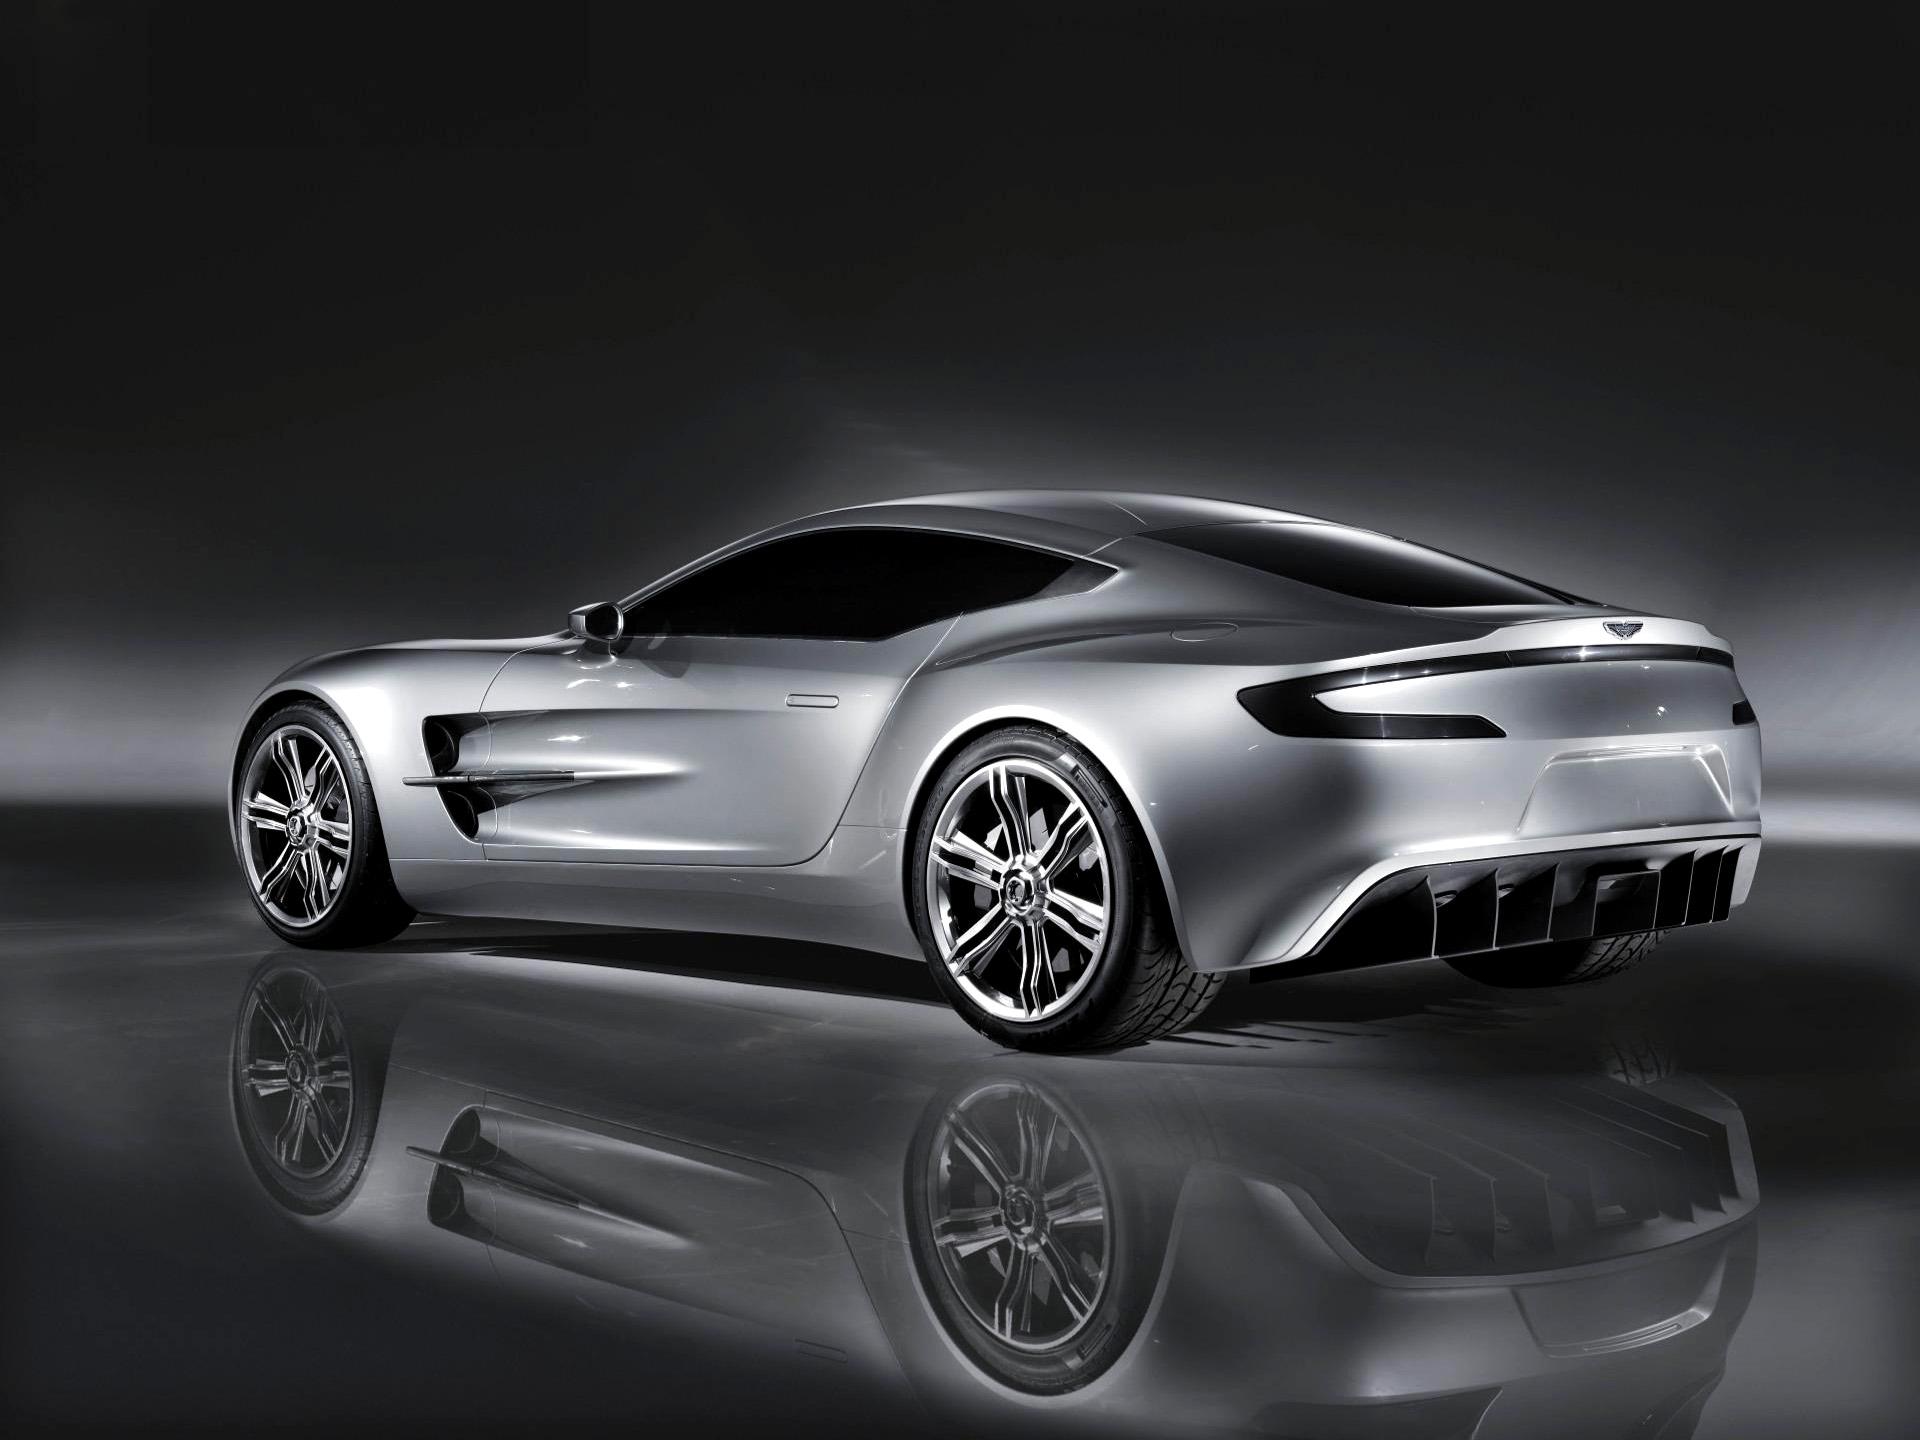 Aston martin one 77 wallpaper